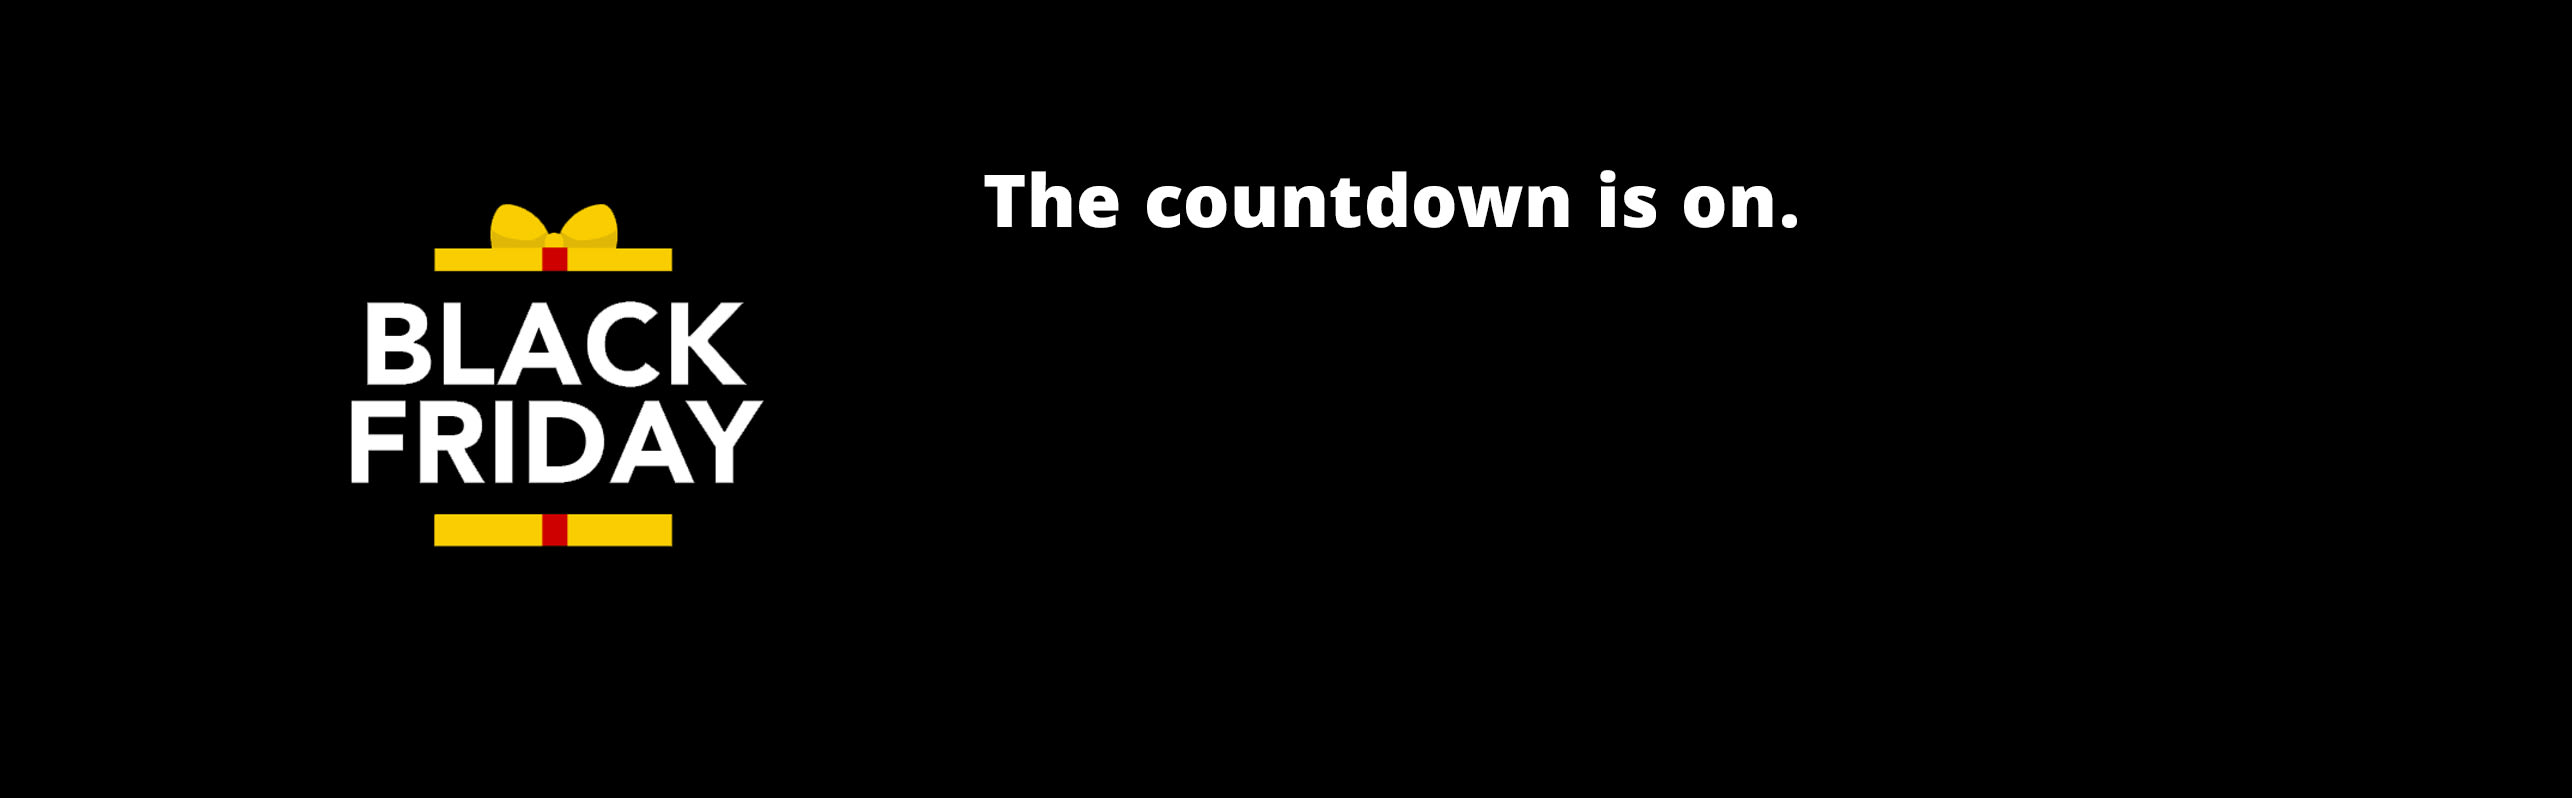 www_black-friday_2019_countdown